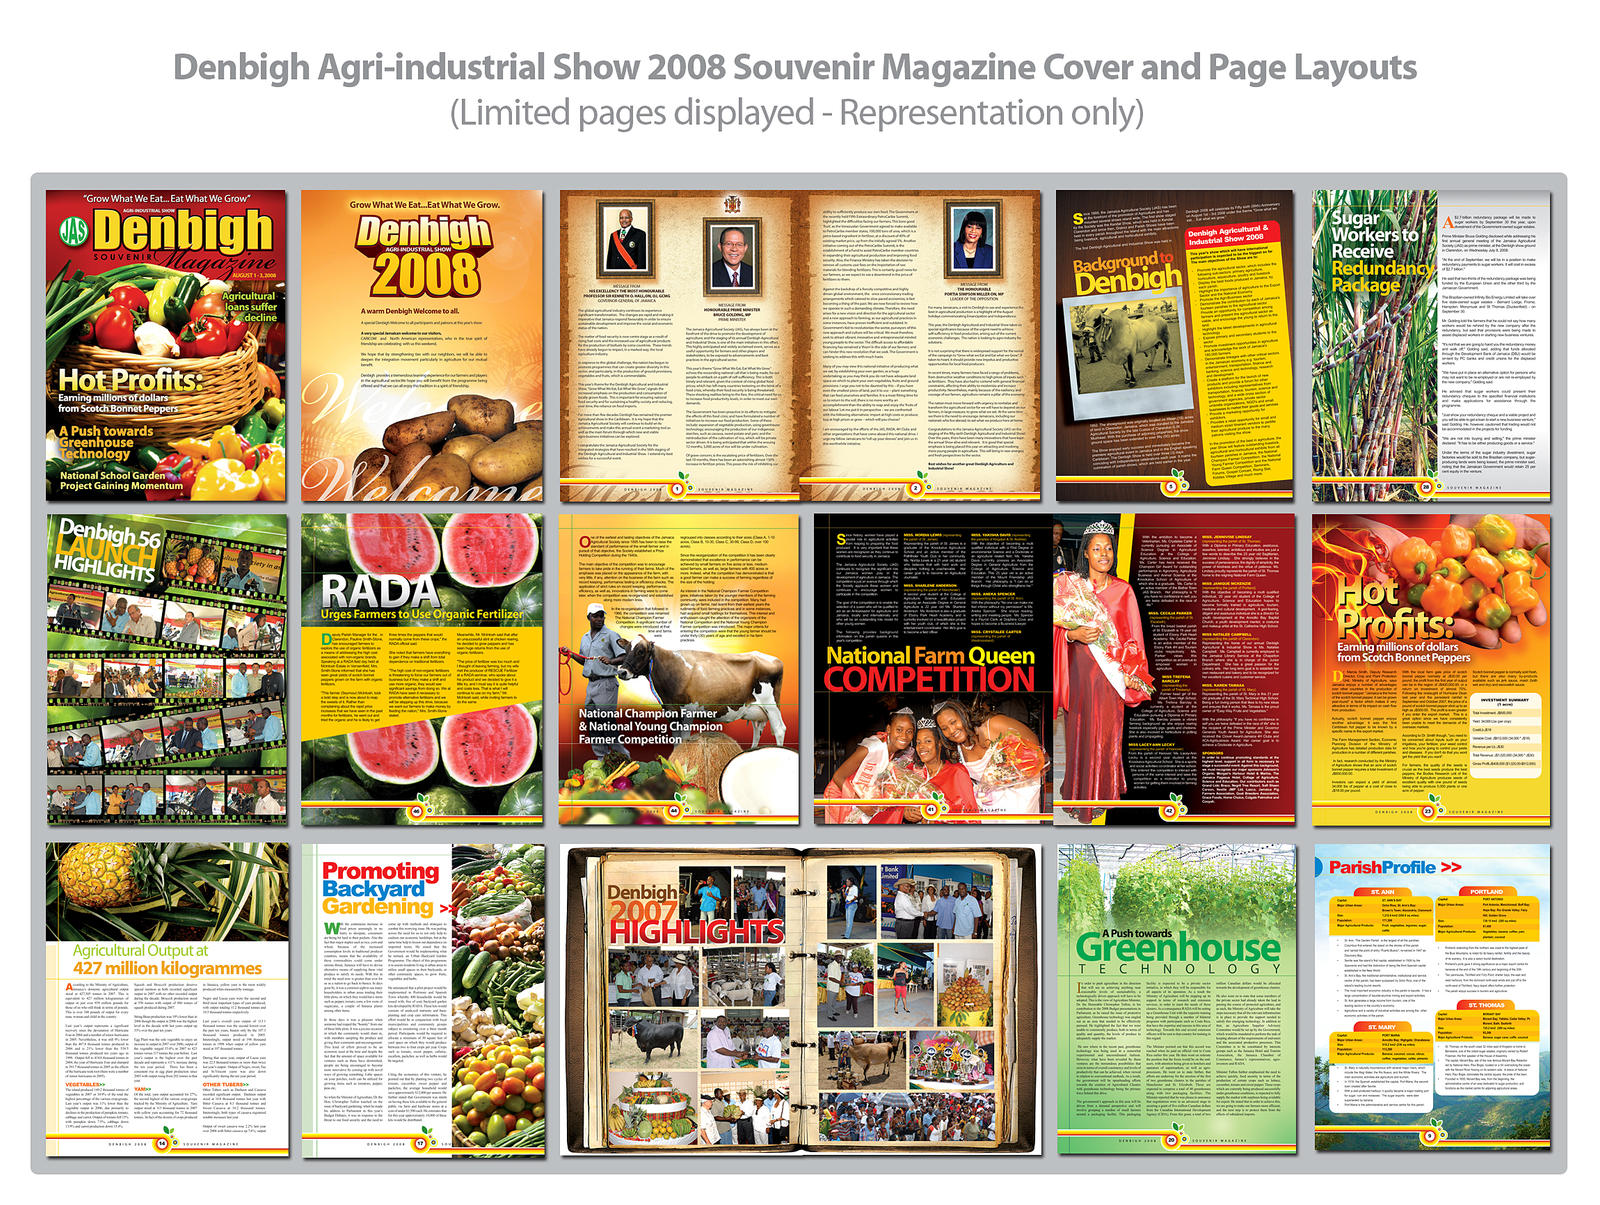 Denbigh Magazine Page Layouts by innografiks on DeviantArt